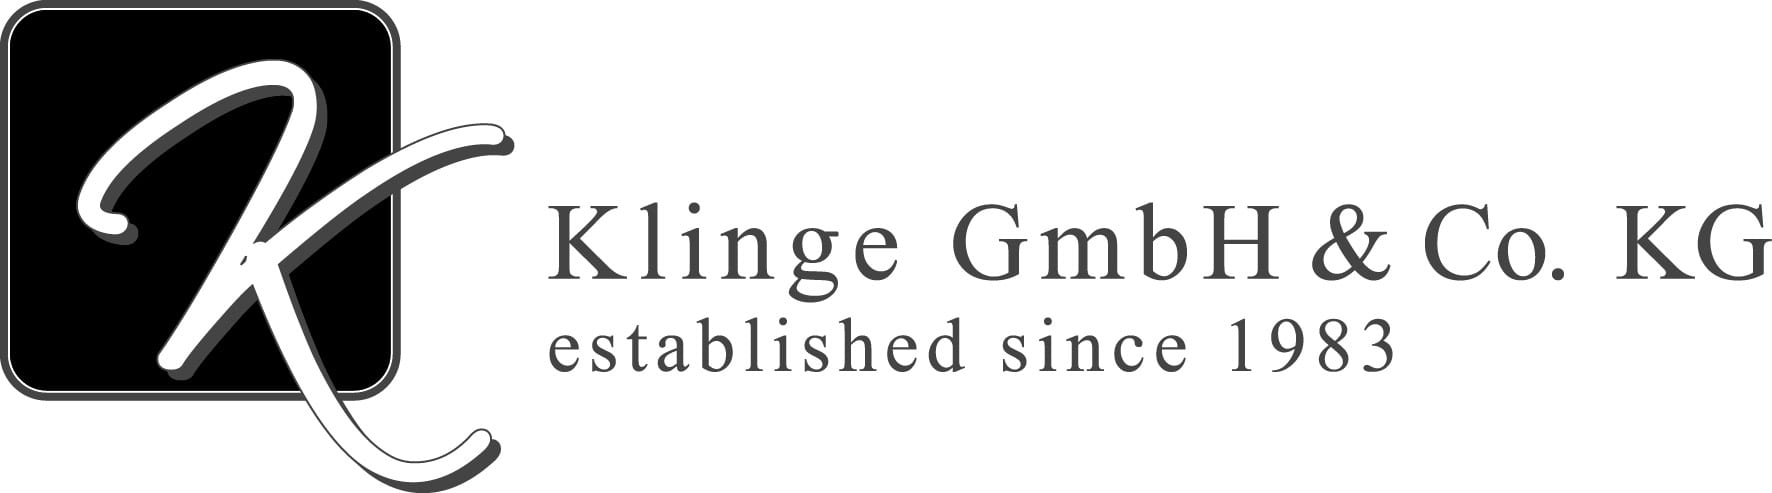 Klinge Gmbh & Co. KG